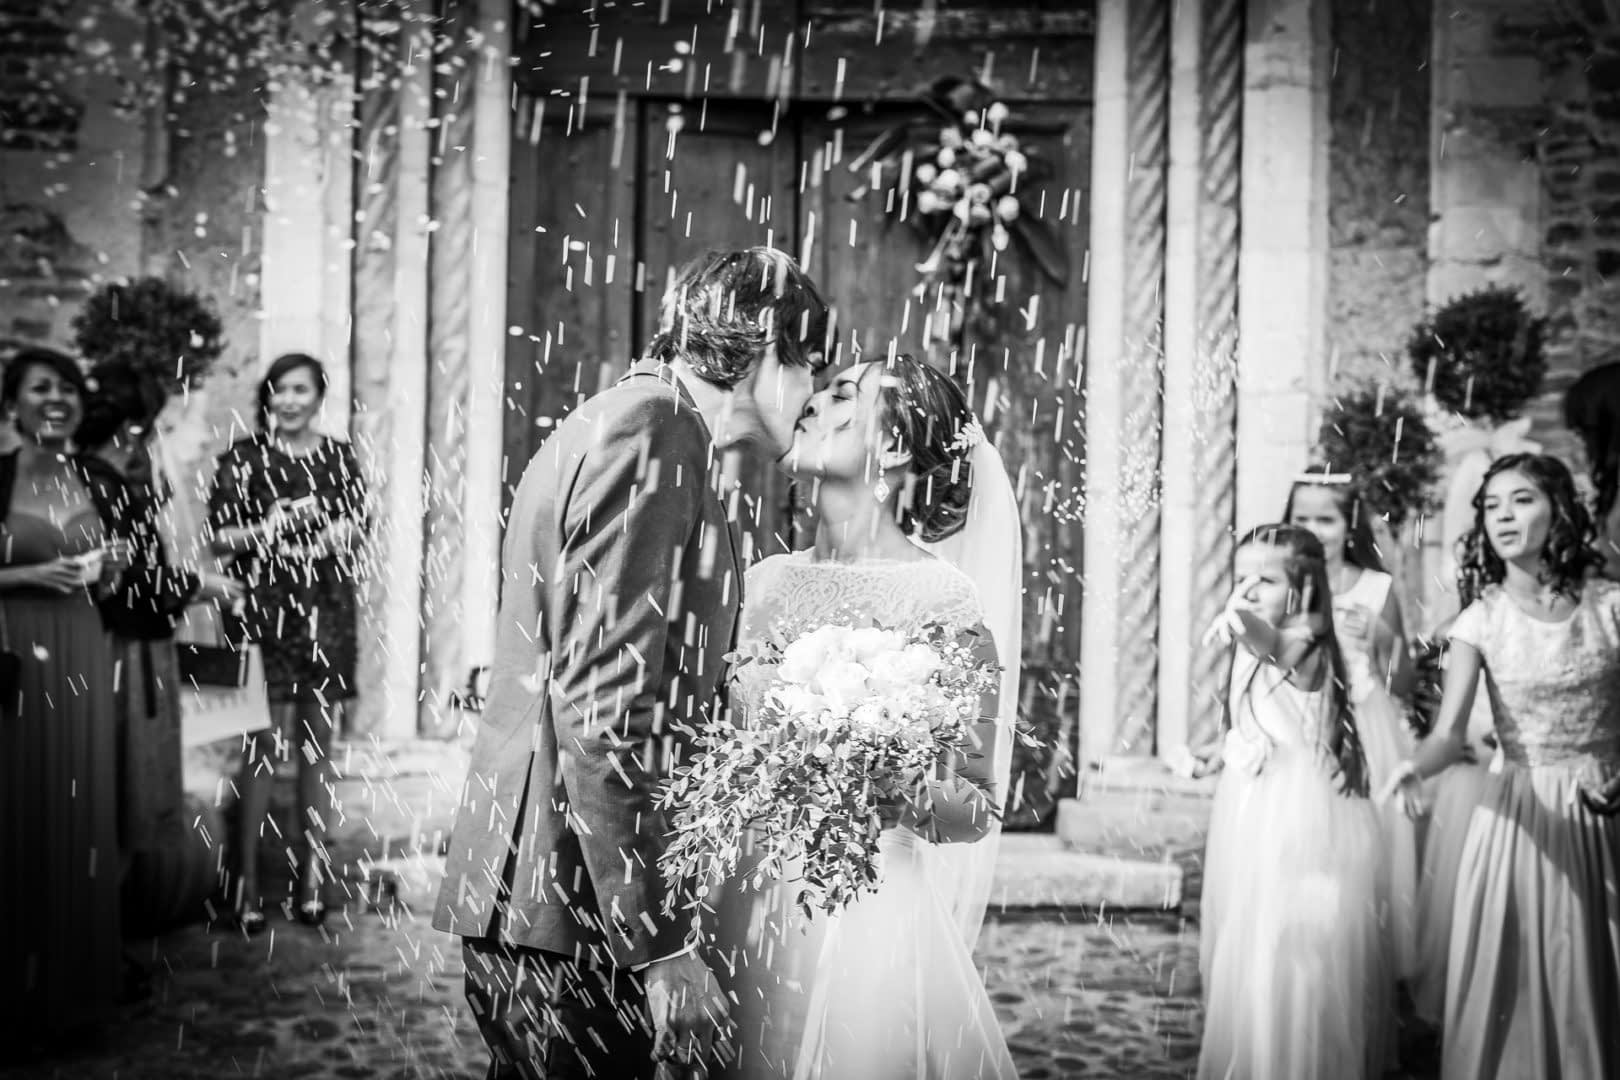 matrimonio-perugia-foto-fotografo-nozze-umbria-italia_MG_6023-Modifica